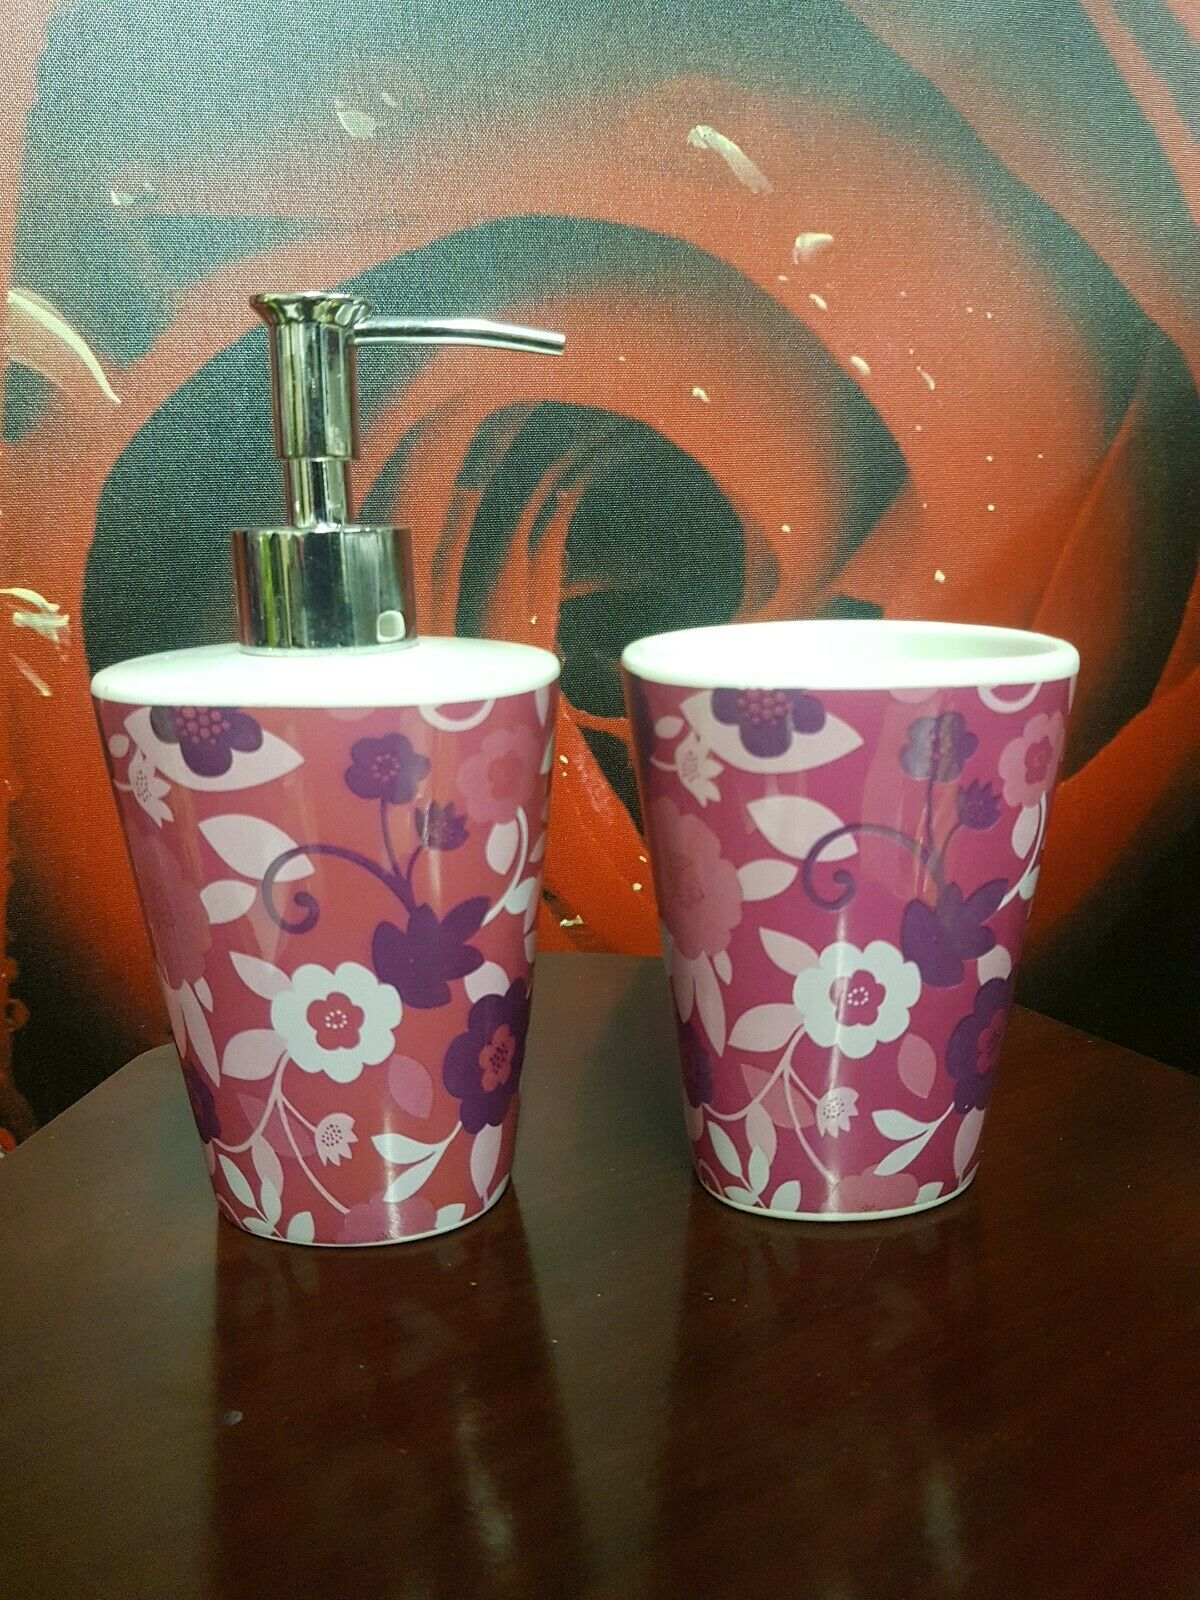 Pink Bathroom Ceramic Soap Dispenser And Tumbler - Toothbrush Holder Cup Storage